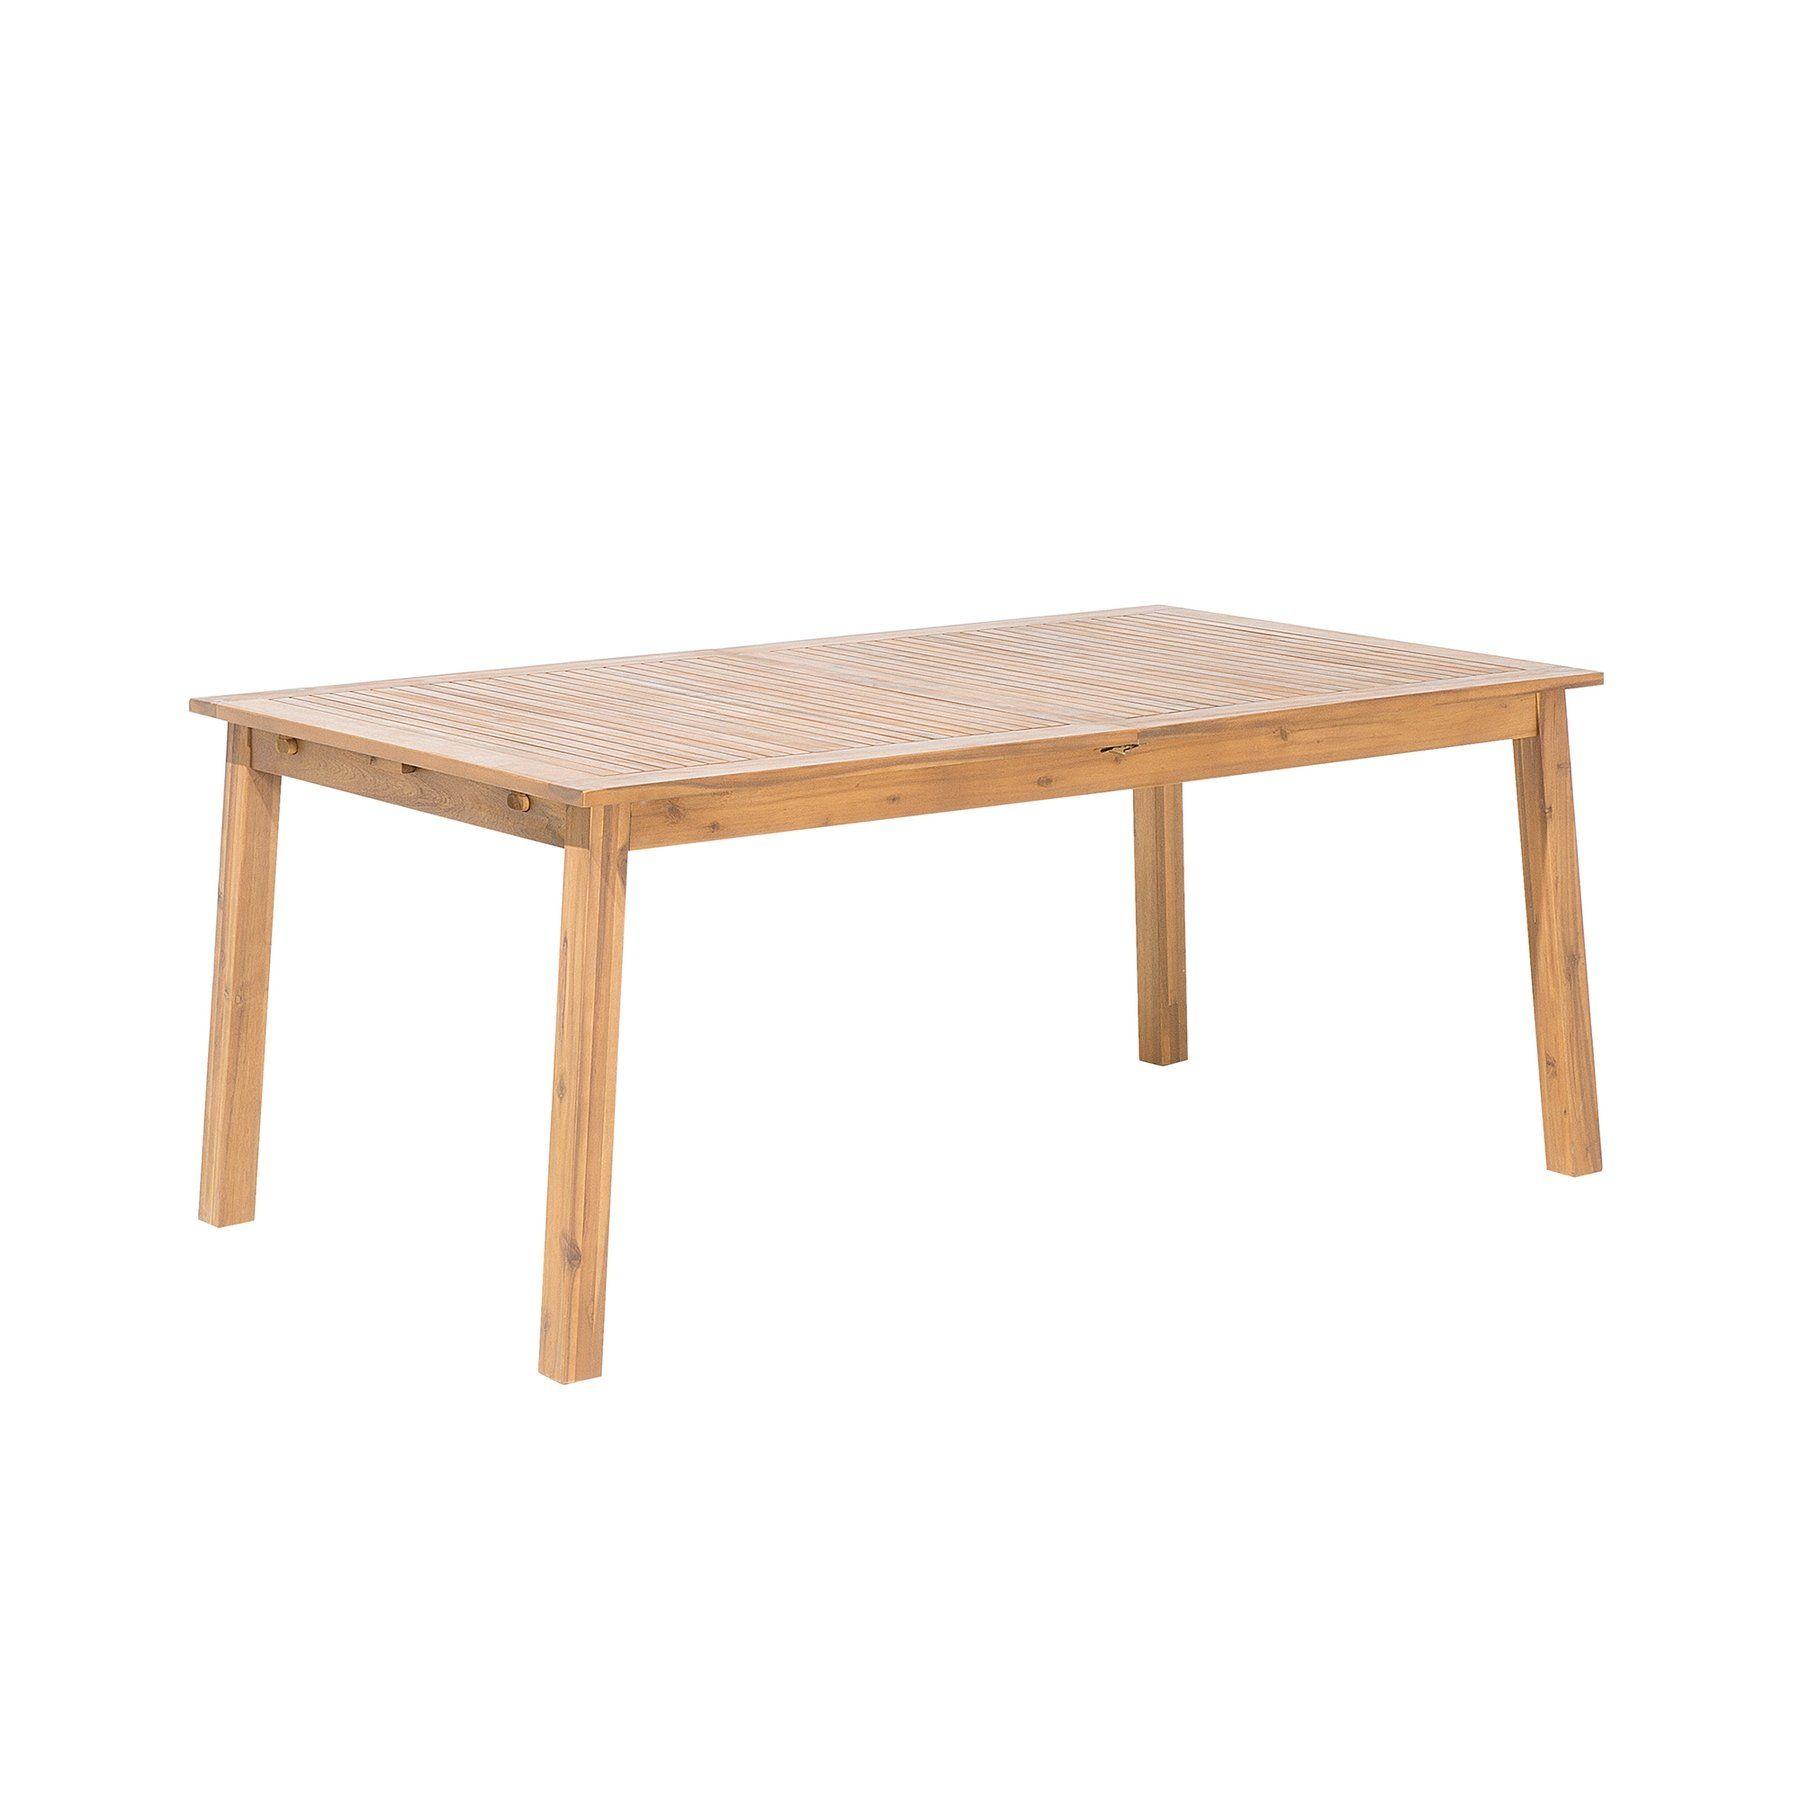 Gartentisch Holz 180 240 X 100 Cm Ausziehbar Cesana Gartentisch